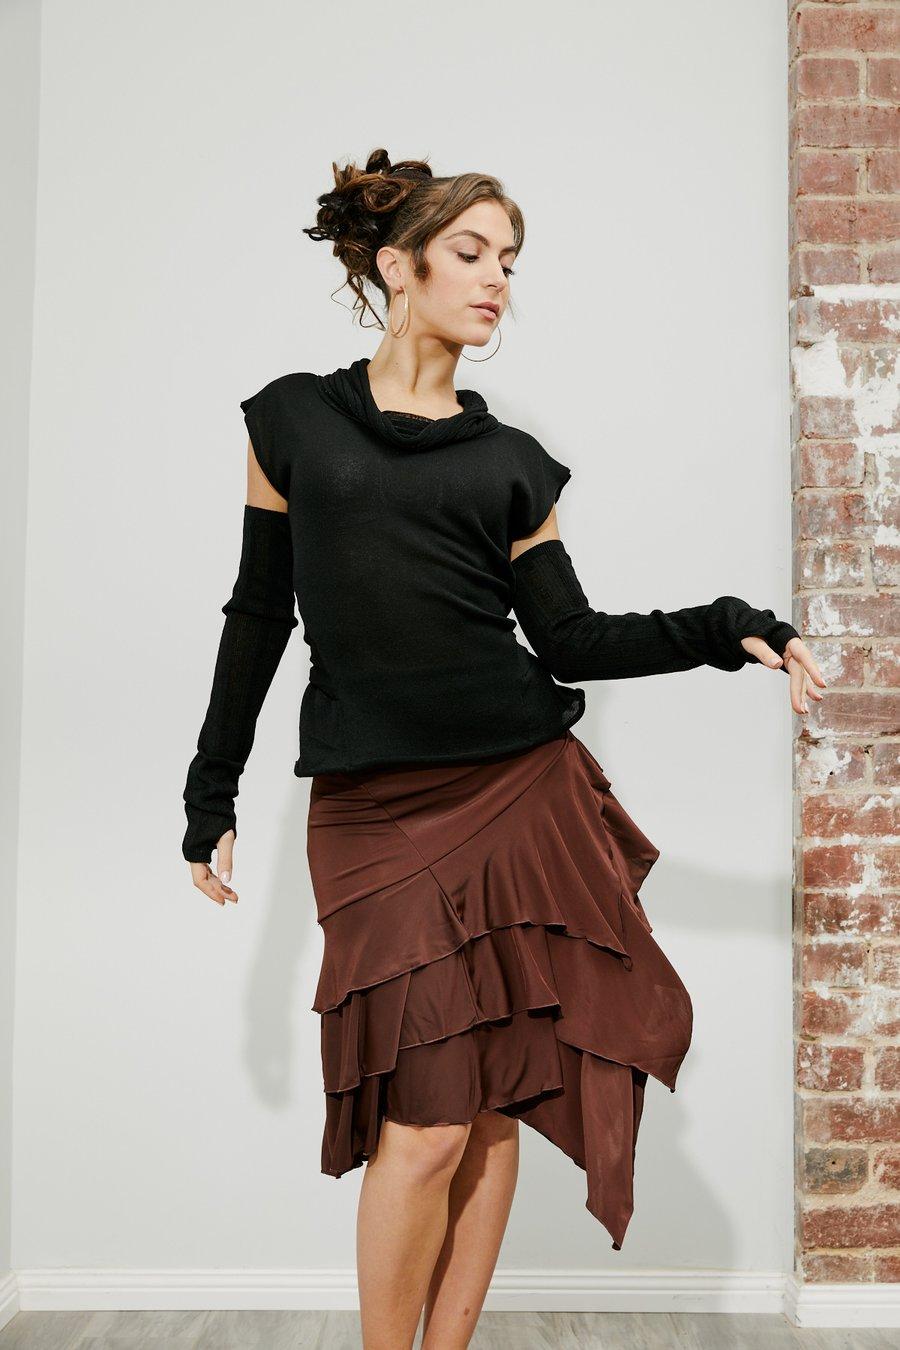 Image of J1810S Latin Flamenco Skirt CHOCO Dancewear latin ballroom